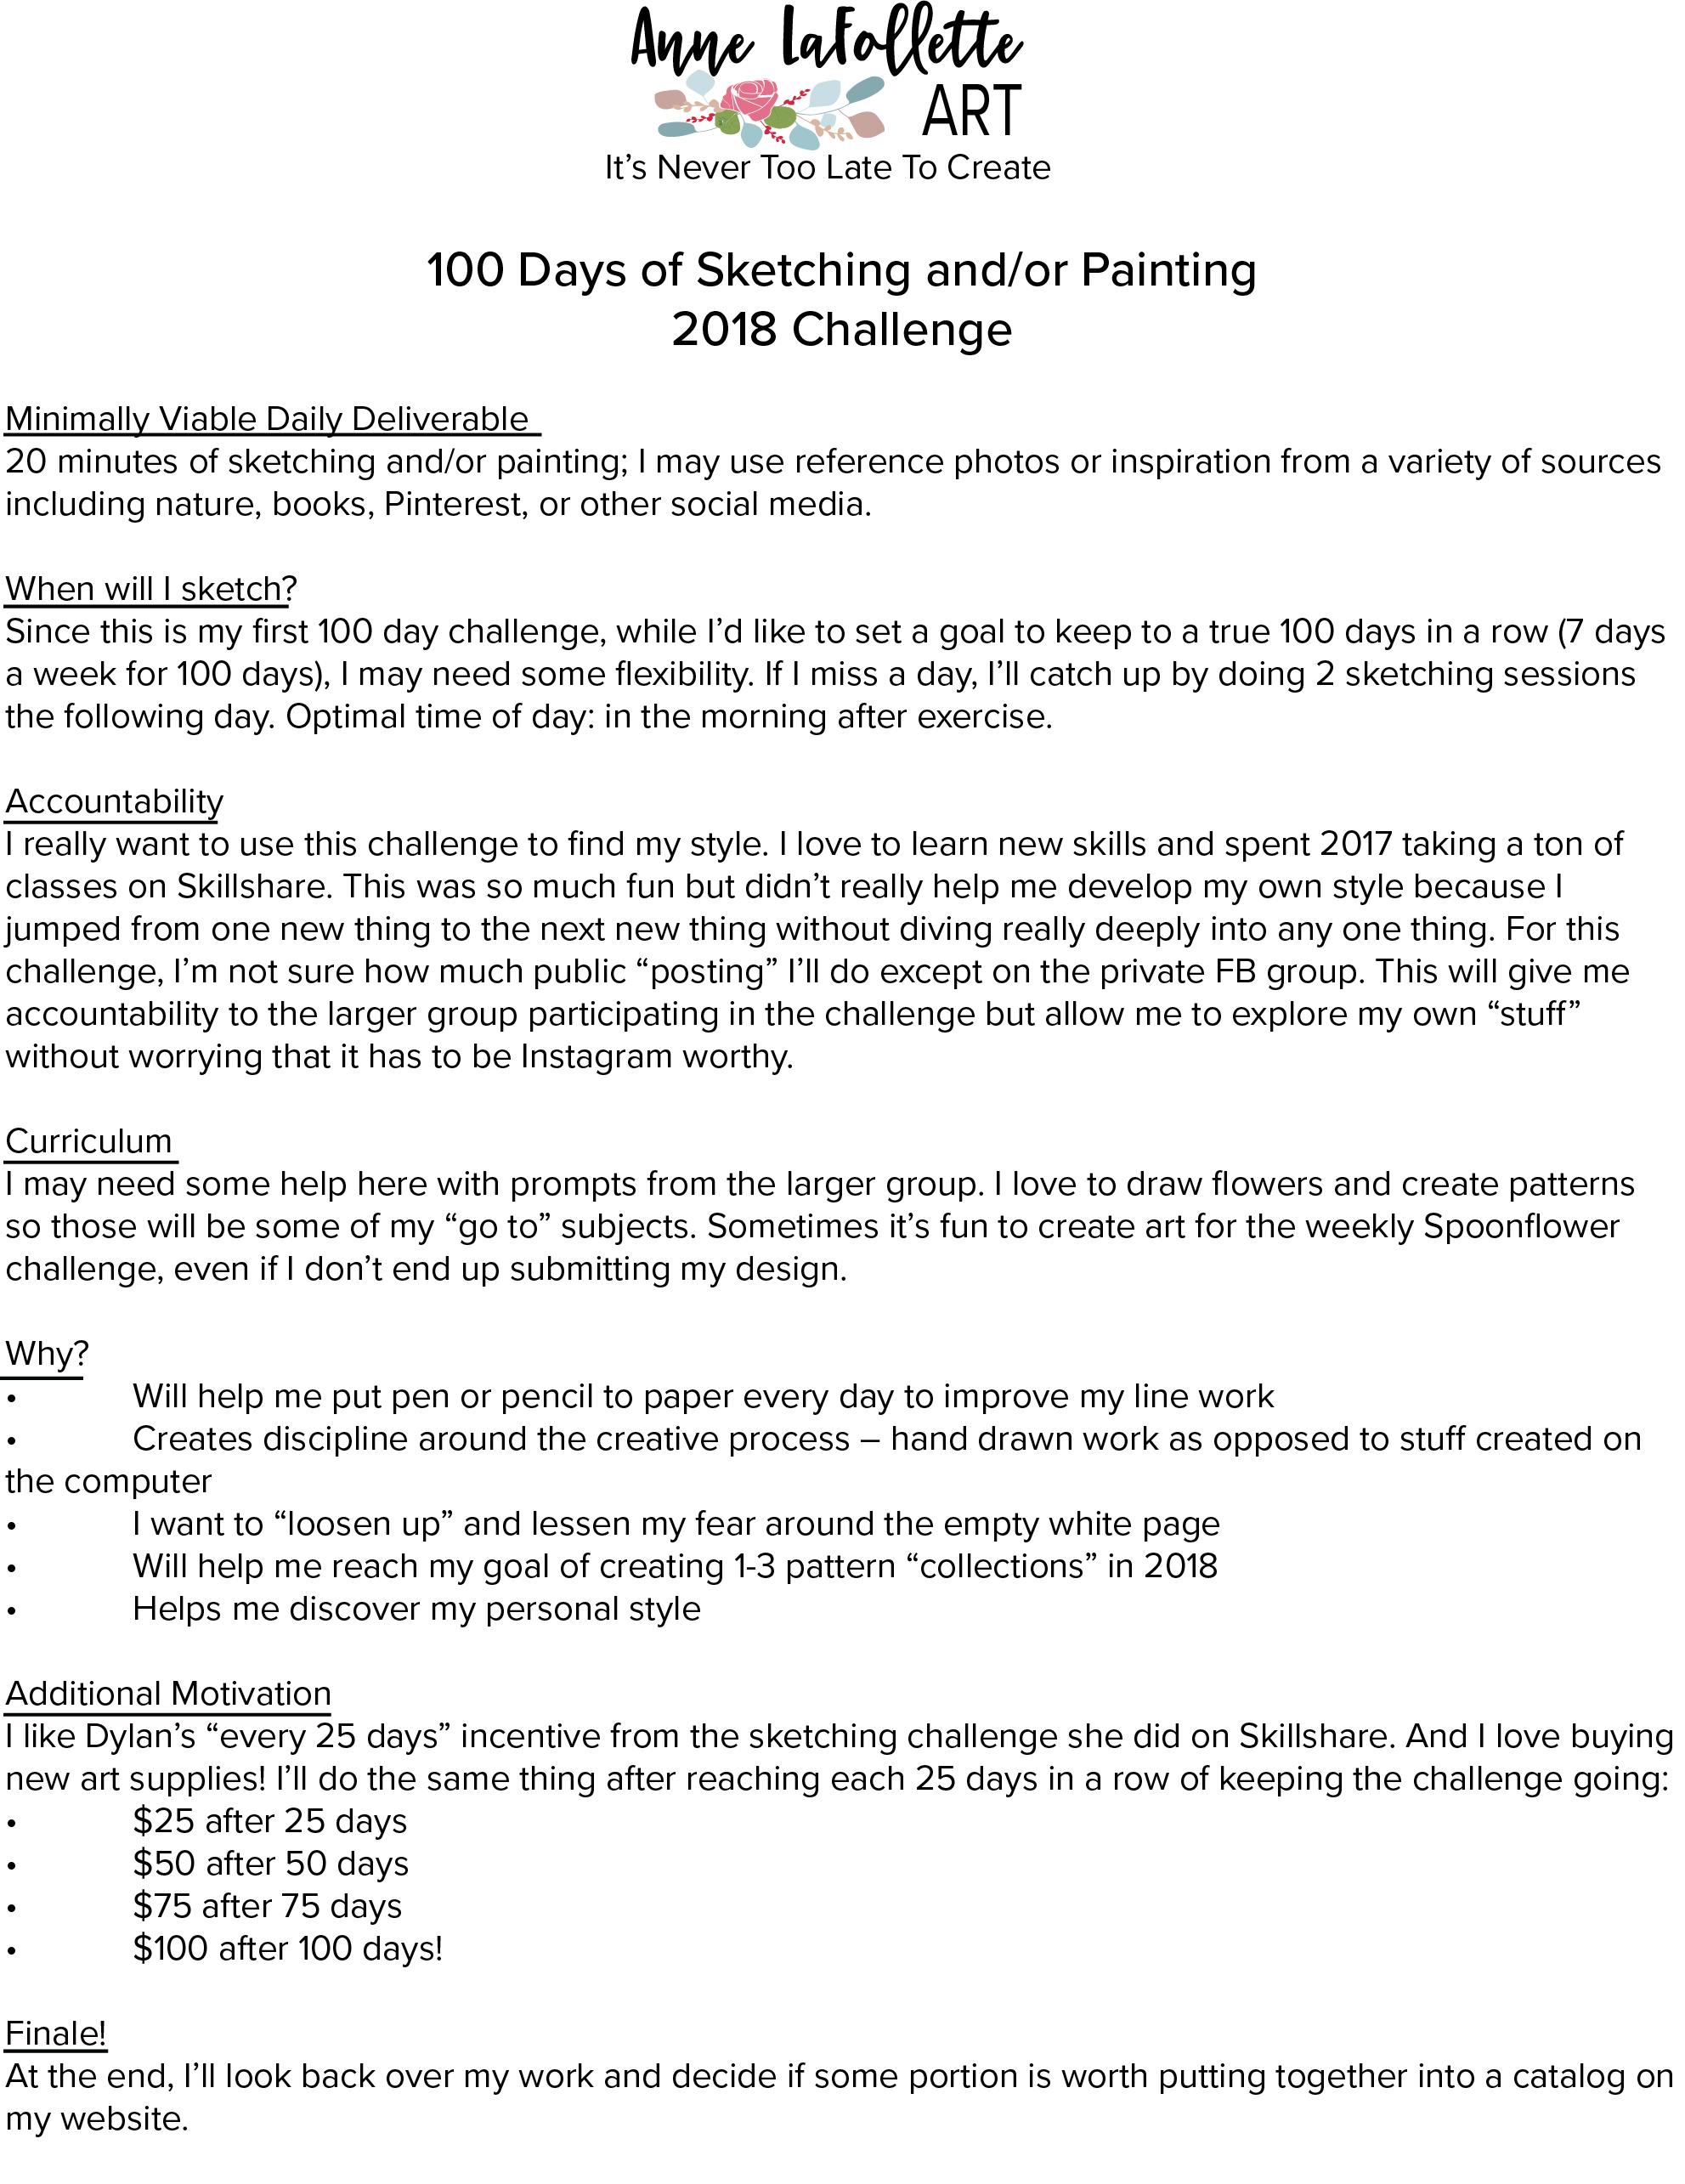 2018 Sketching Challenge.png